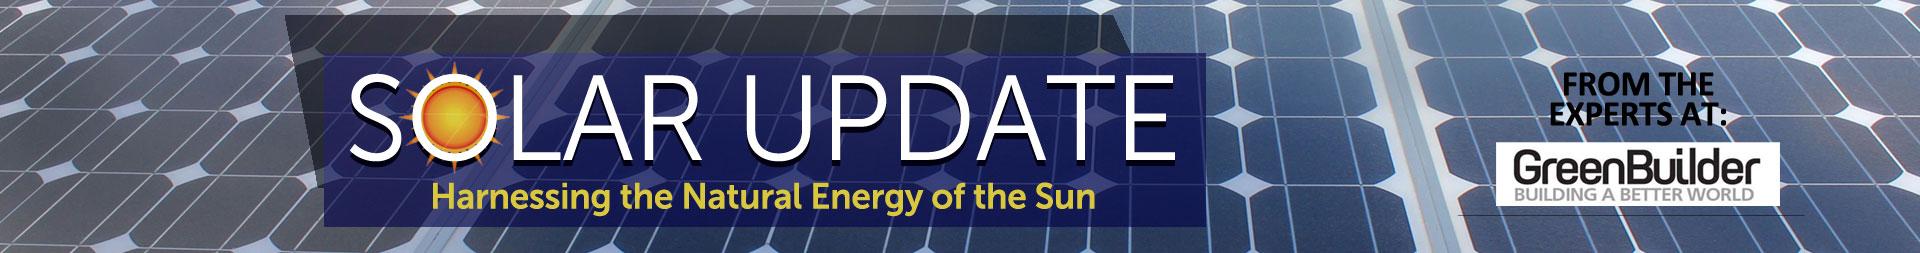 Green Builder Solar Update Banner